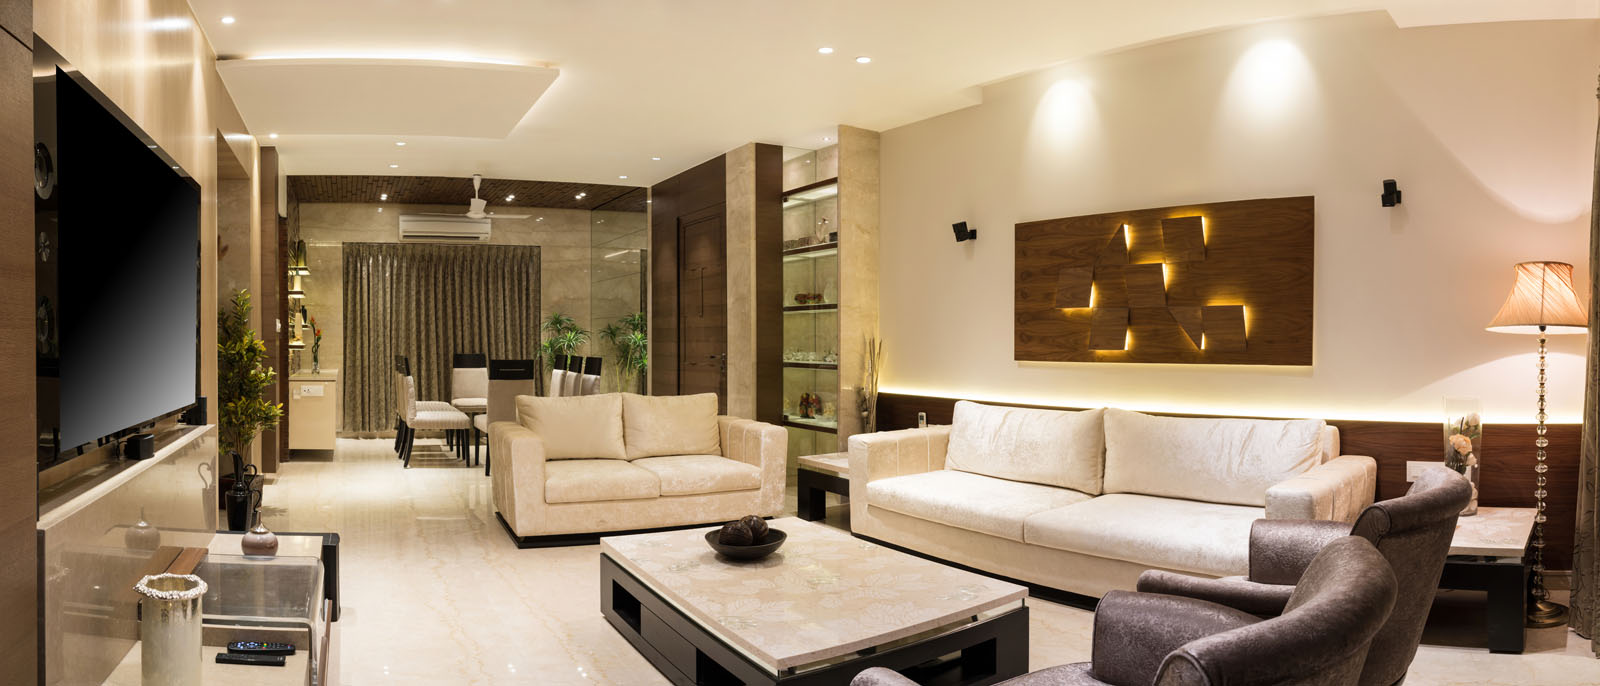 interior-residential-ghatkopar-15